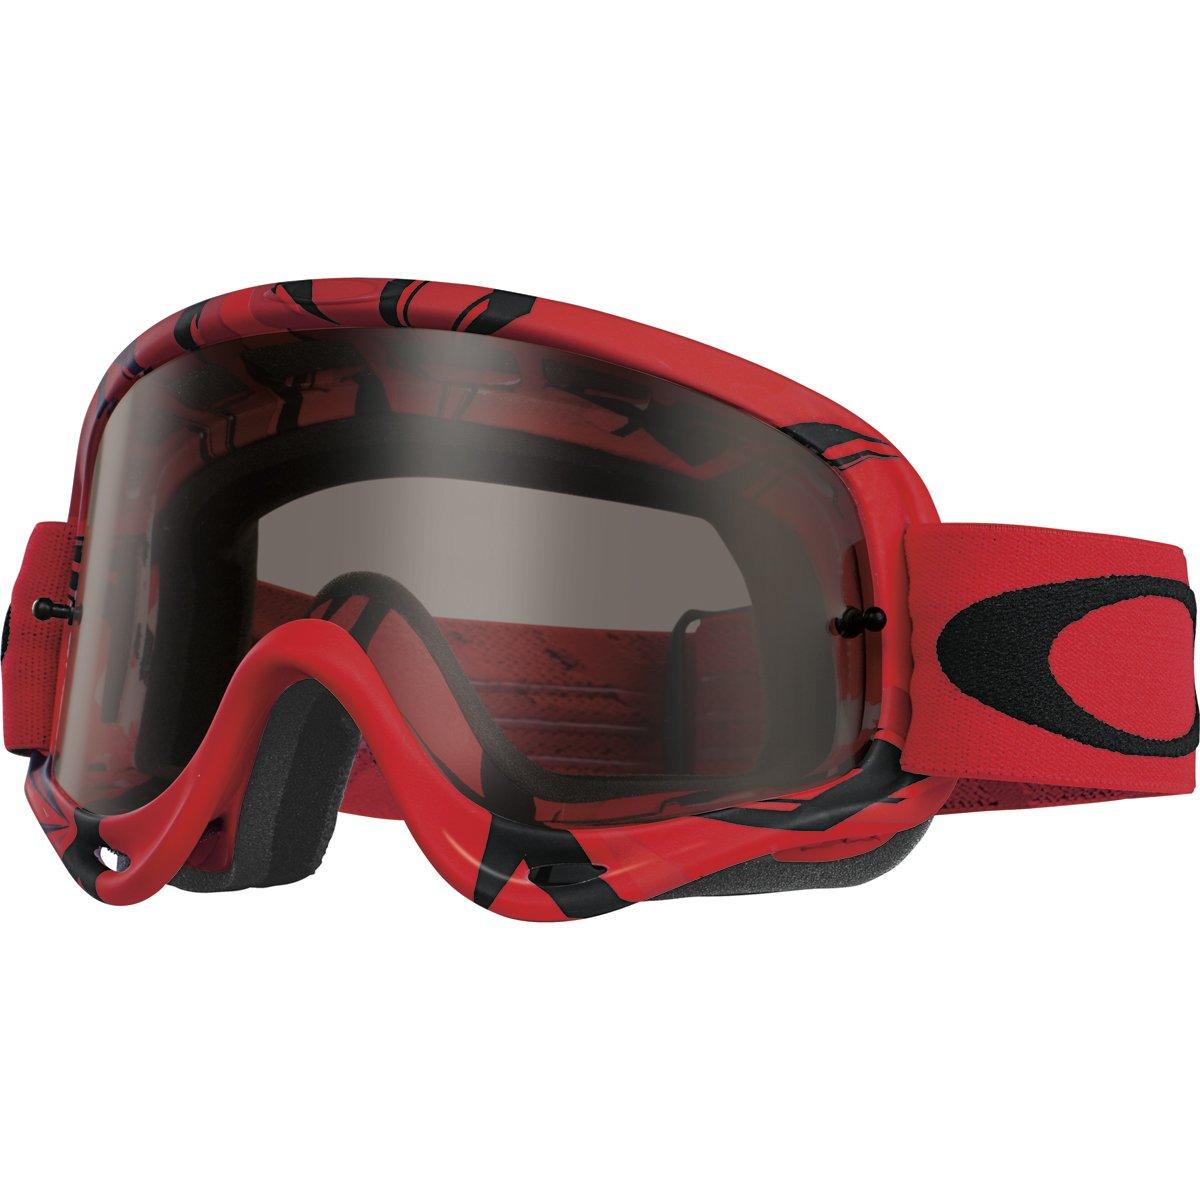 Oakley O-Frame MX Intimidator Goggles (Red/Black Frame/Dark Grey Lens)